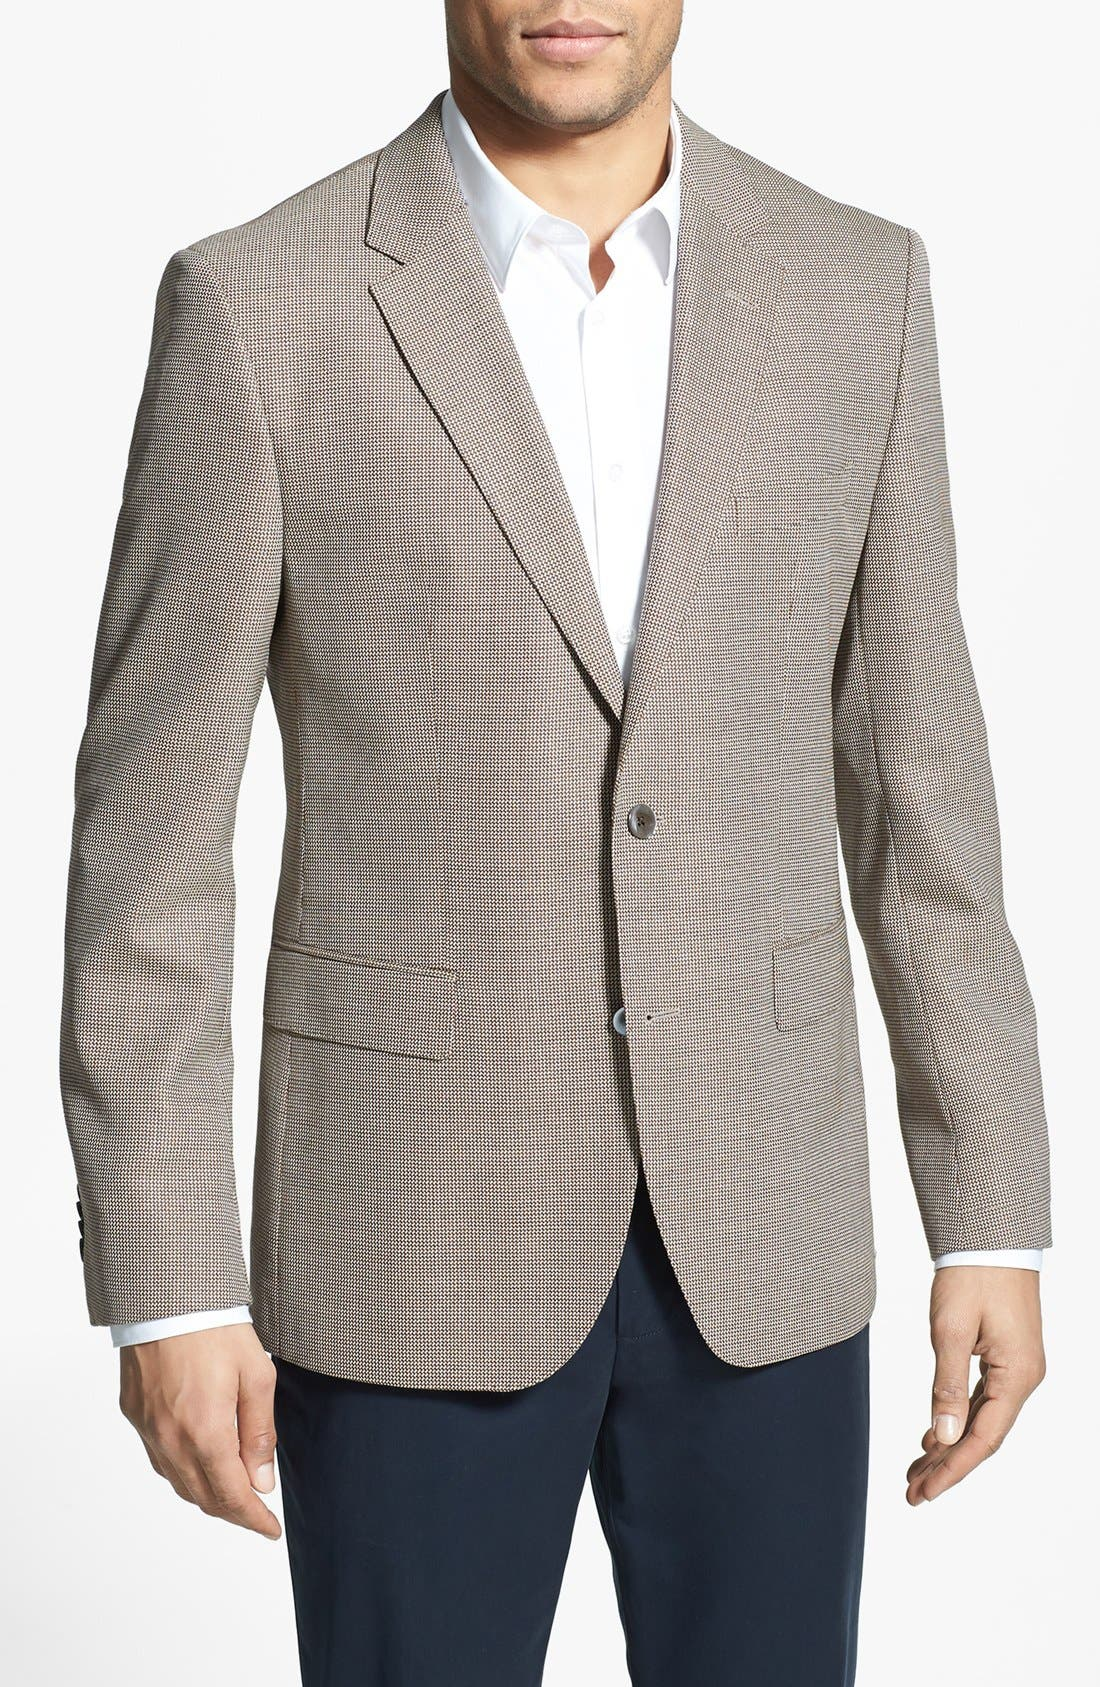 Main Image - BOSS HUGO BOSS 'Jarrett' Trim Fit Wool Sportcoat